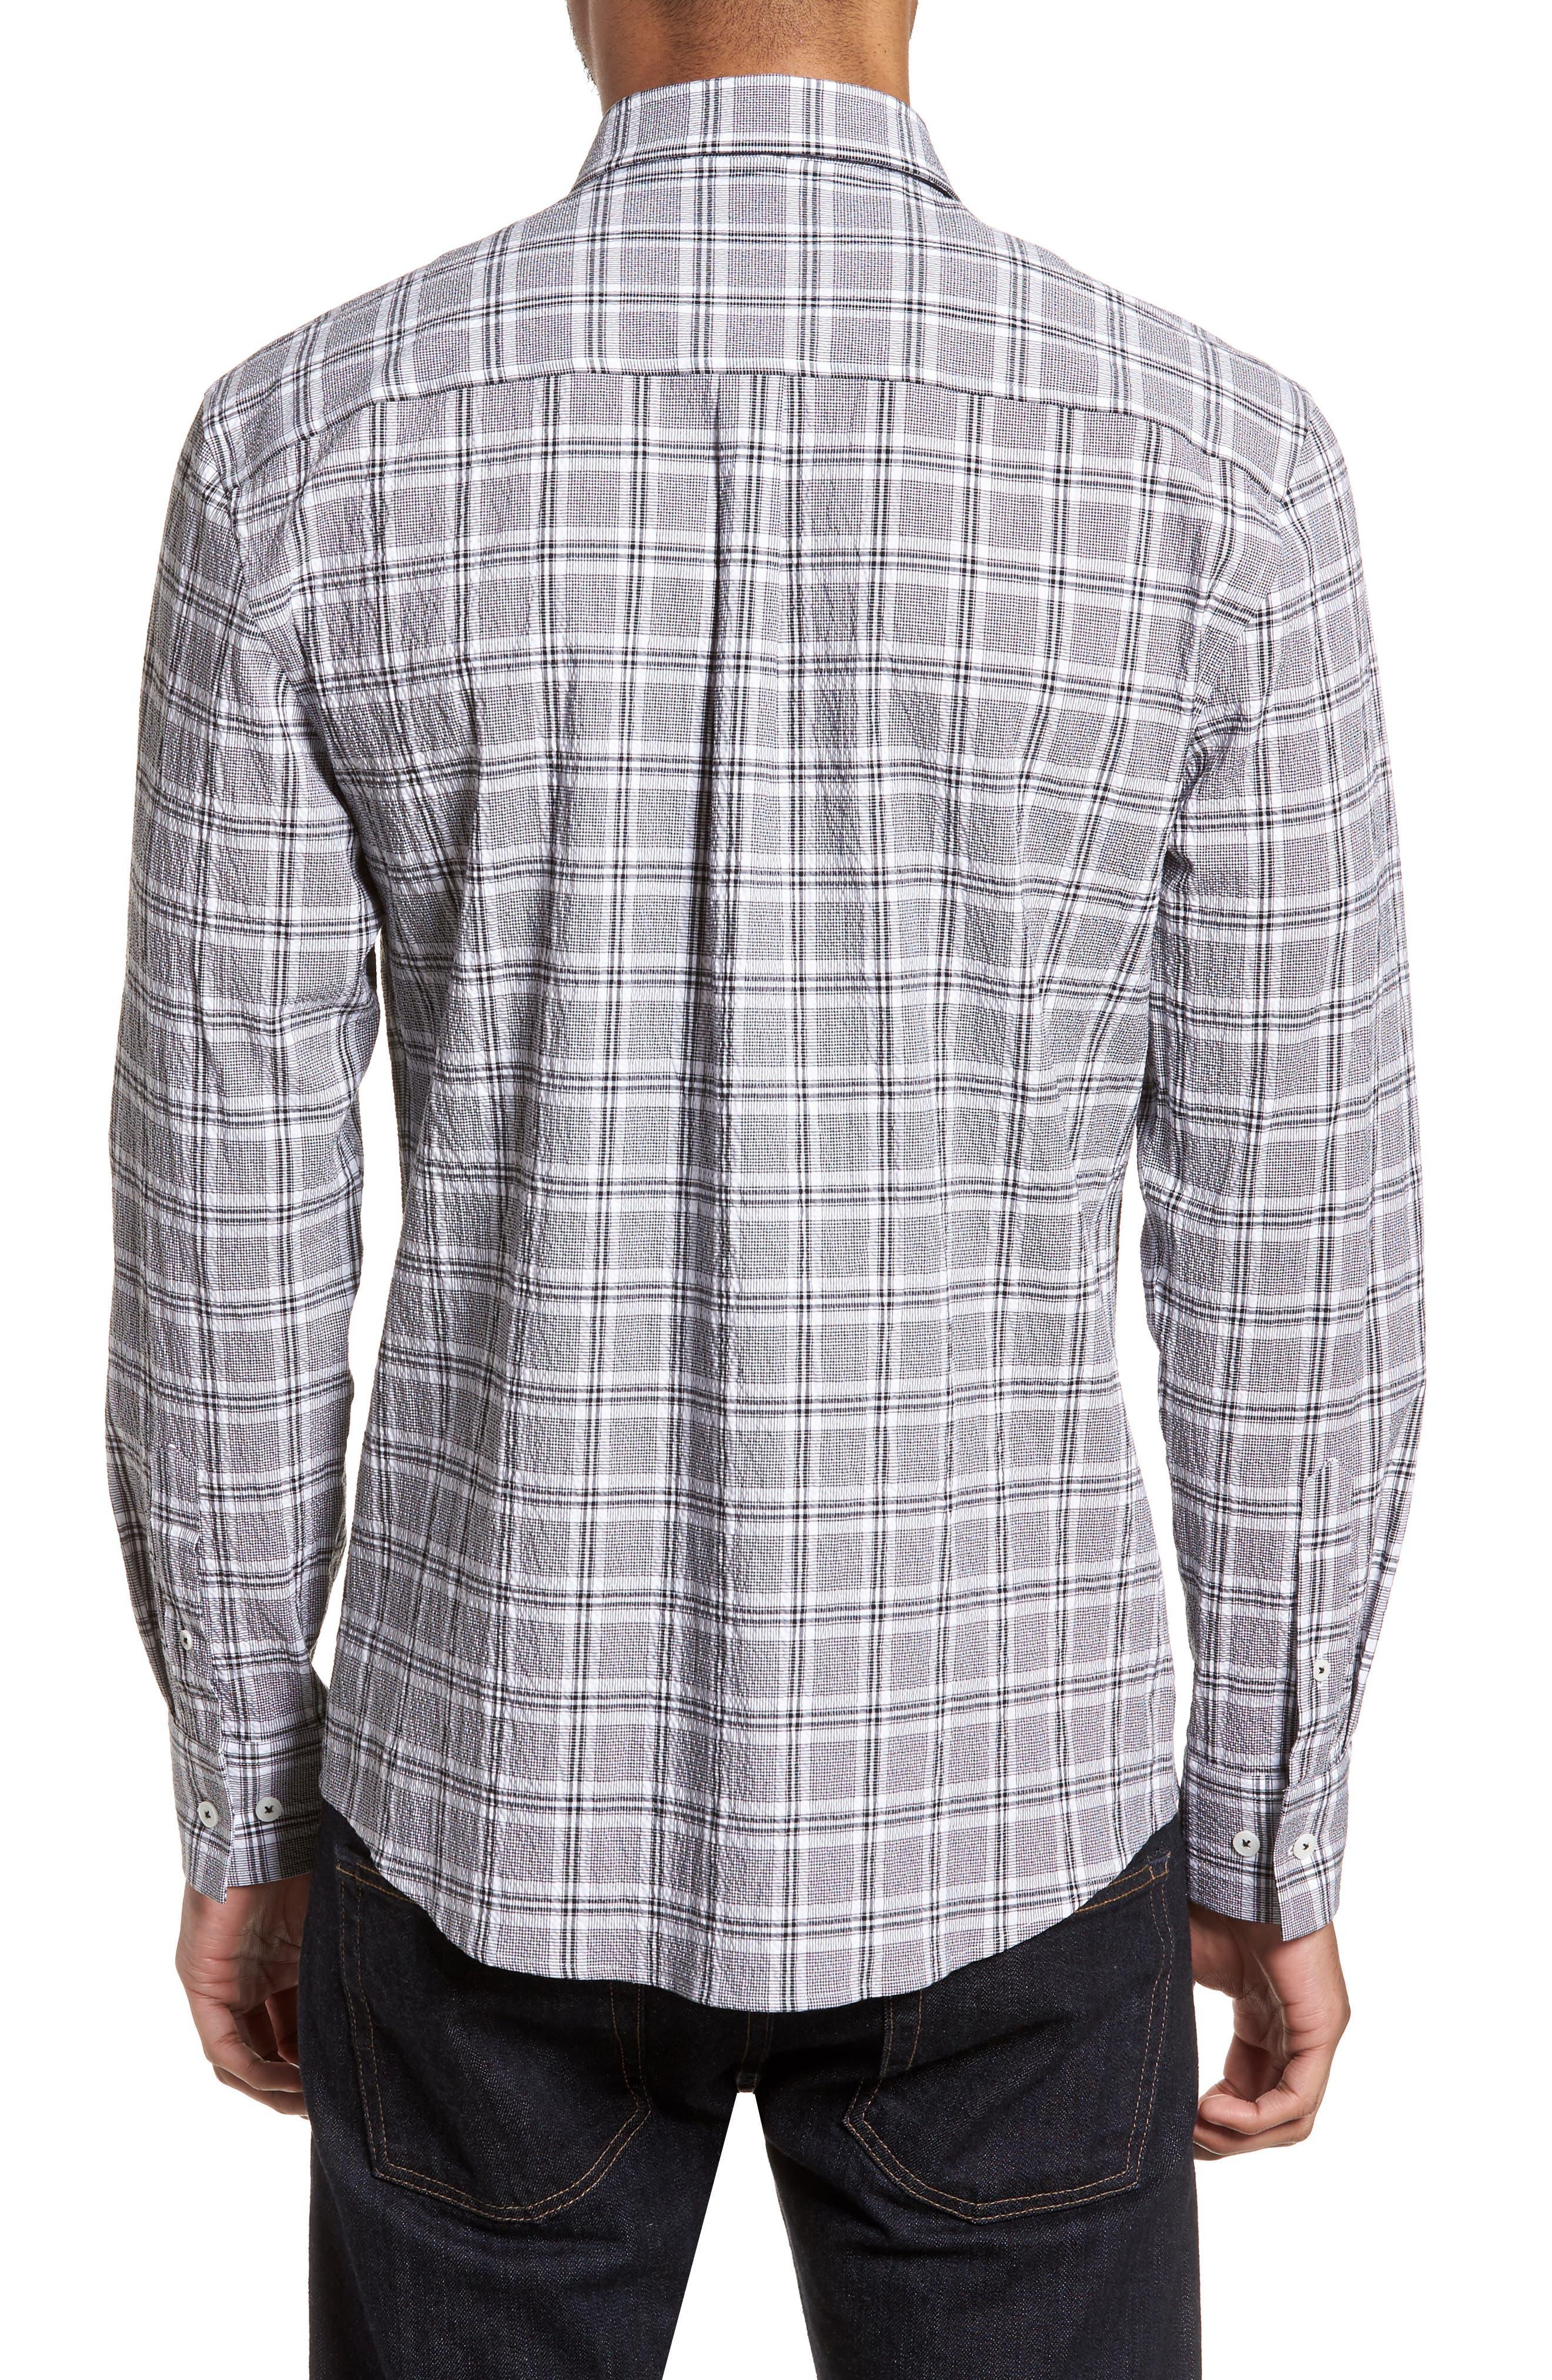 Alternate Image 2  - Vince Camuto Slim Fit Plaid Seersucker Sport Shirt